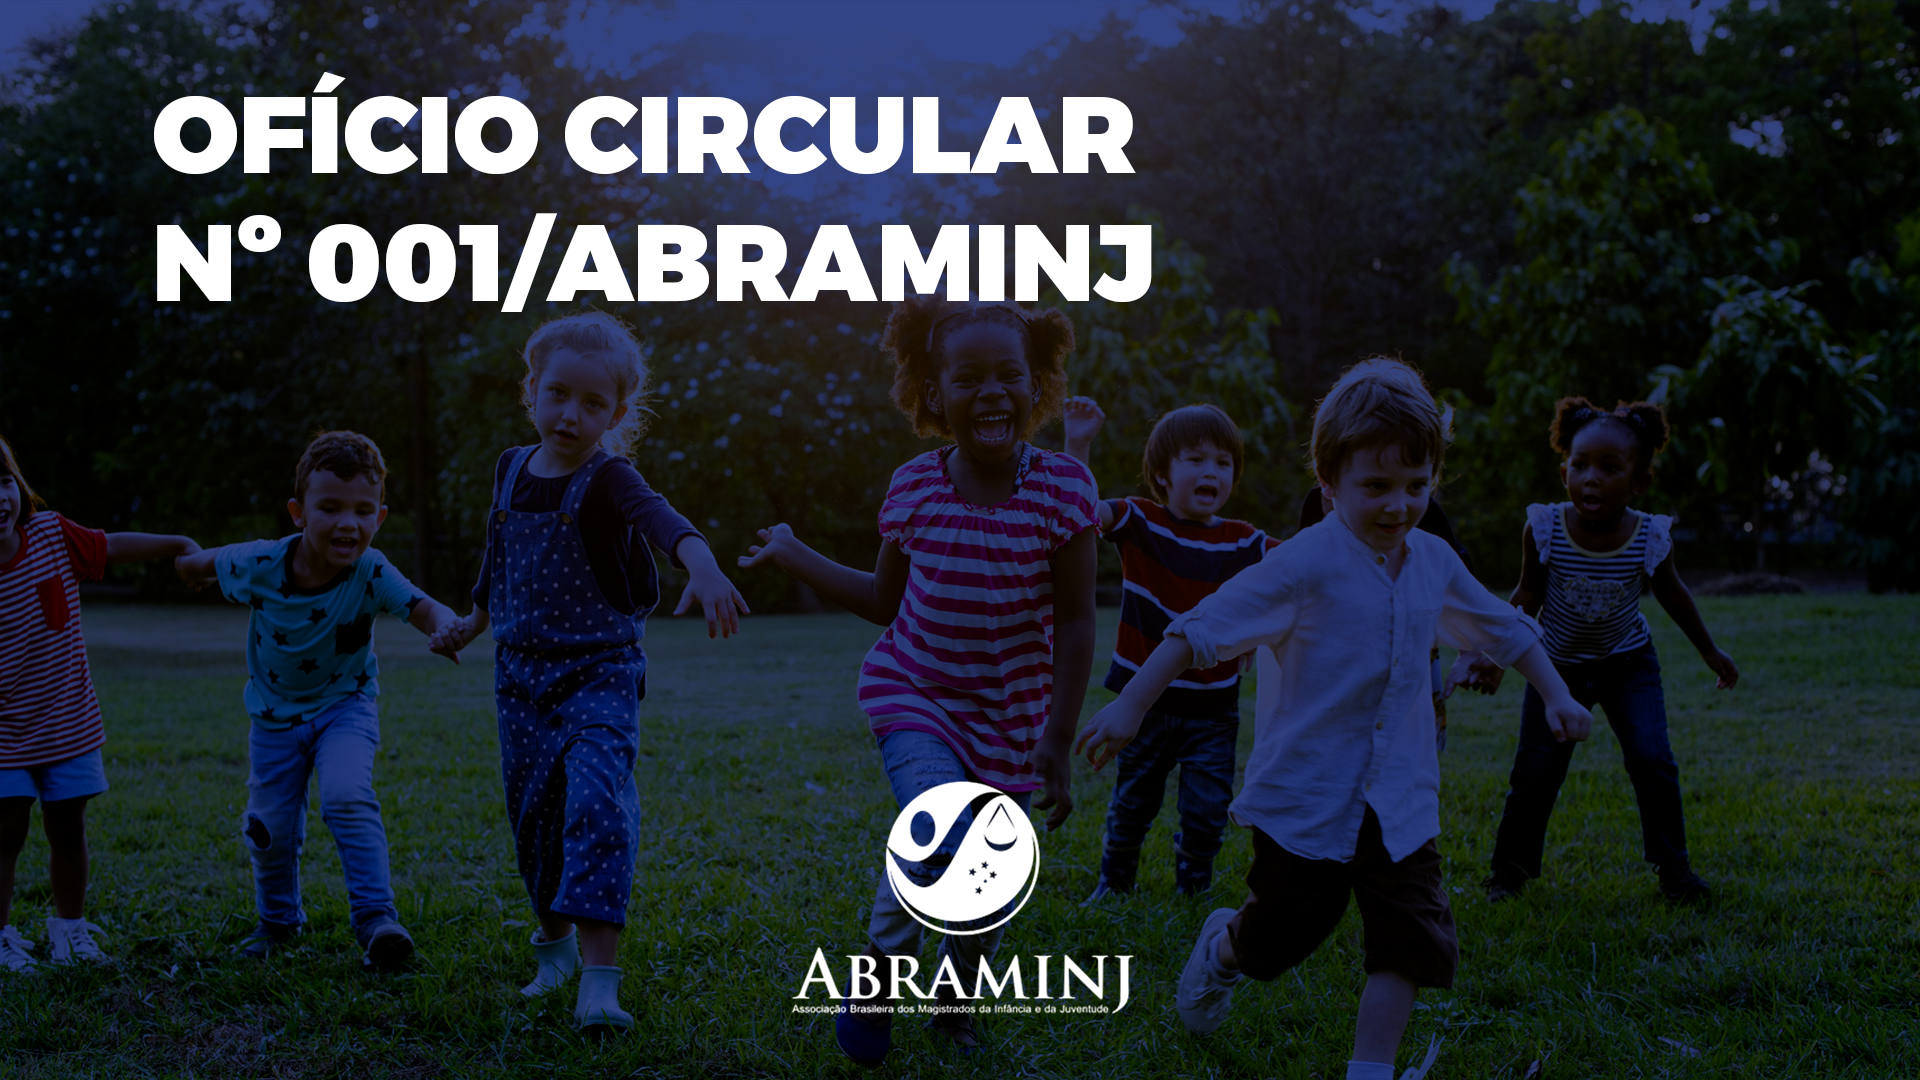 Ofício Circular n. 001/ABRAMINJ